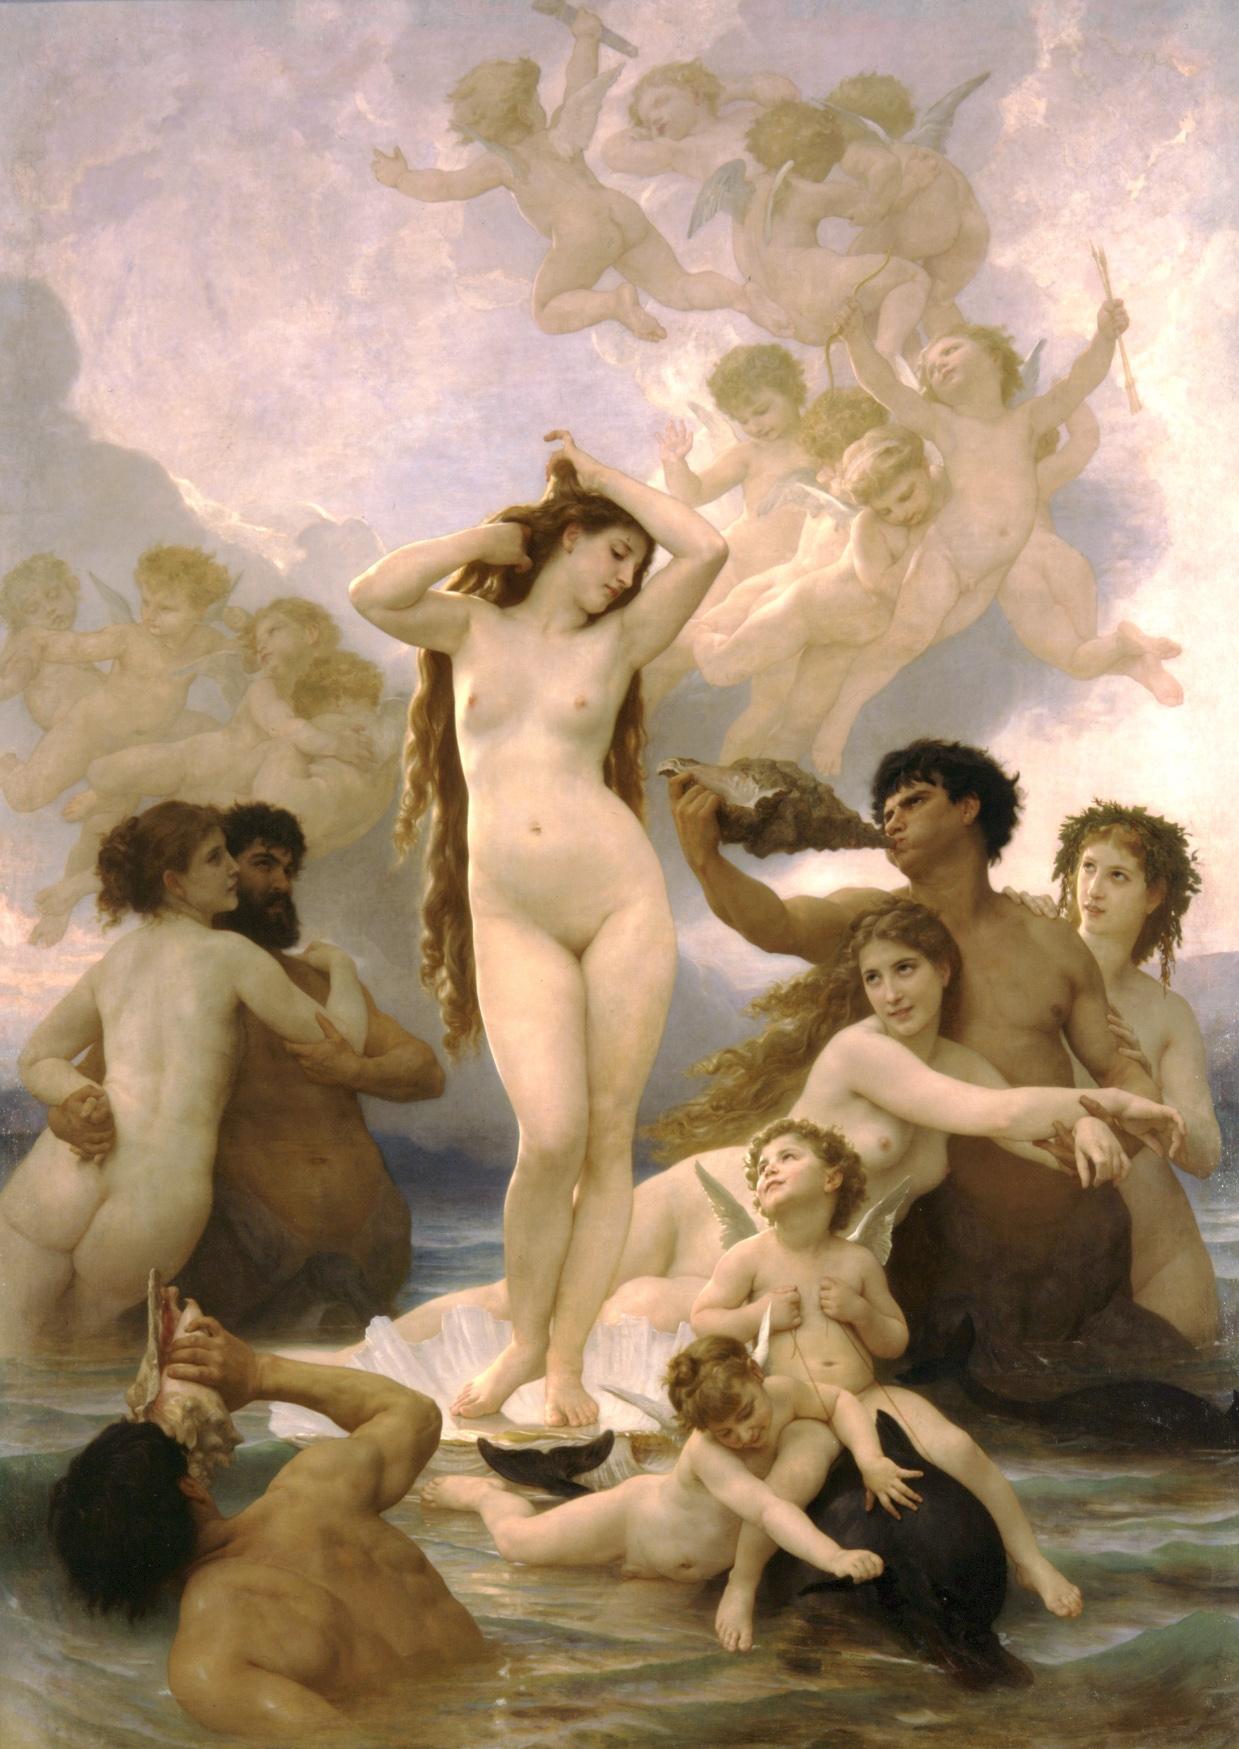 william-adolphe_bouguereau_1825-1905_-_the_birth_of_venus_1879